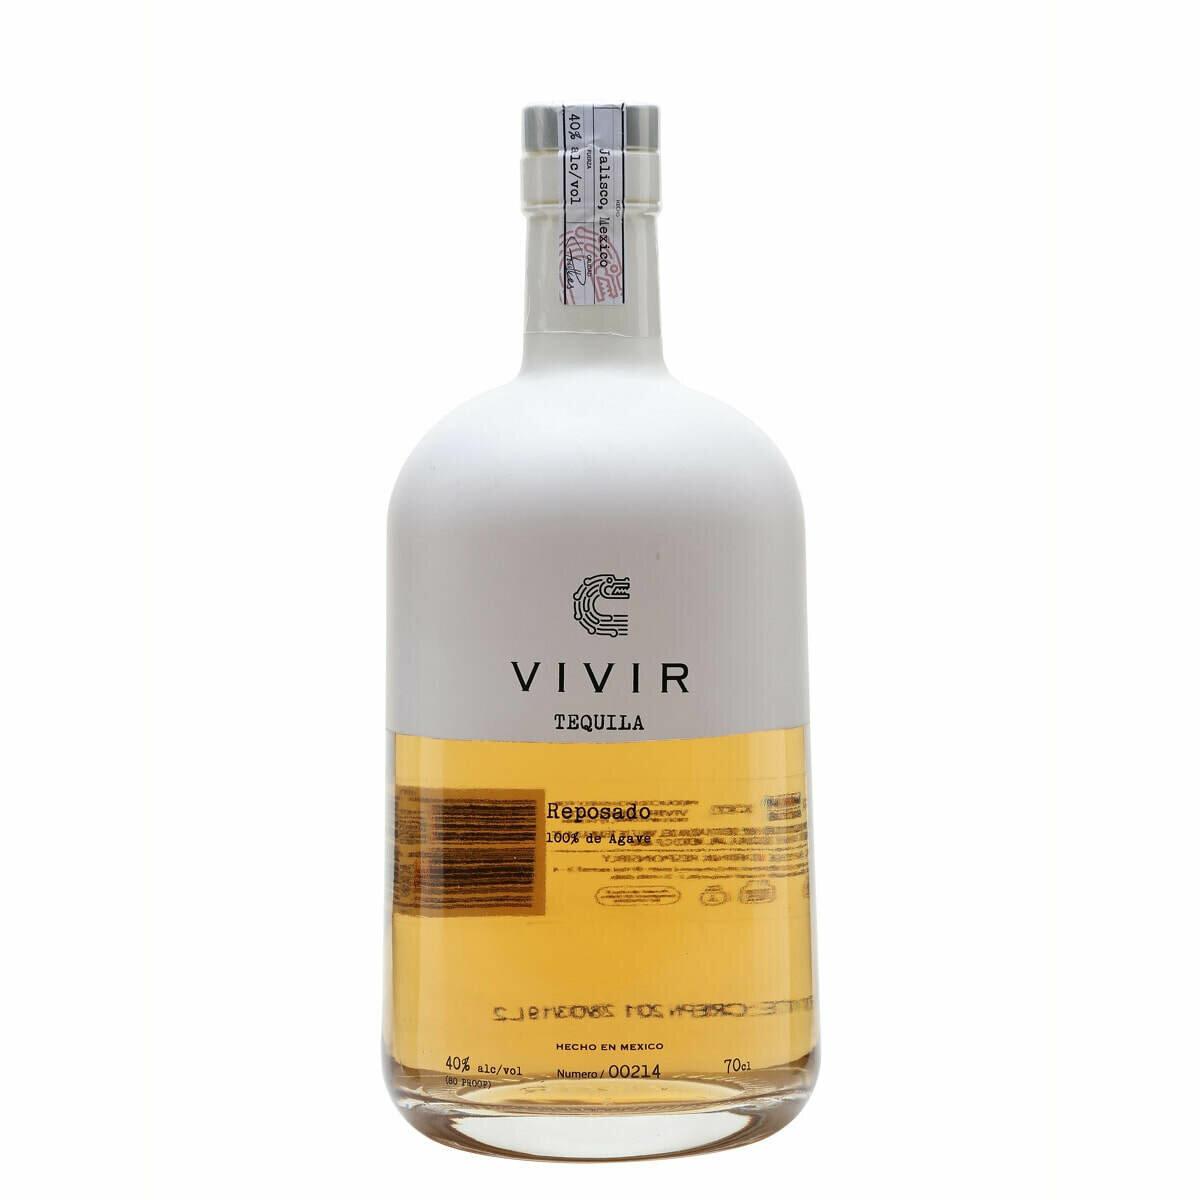 VIVIR Tequila Reposado